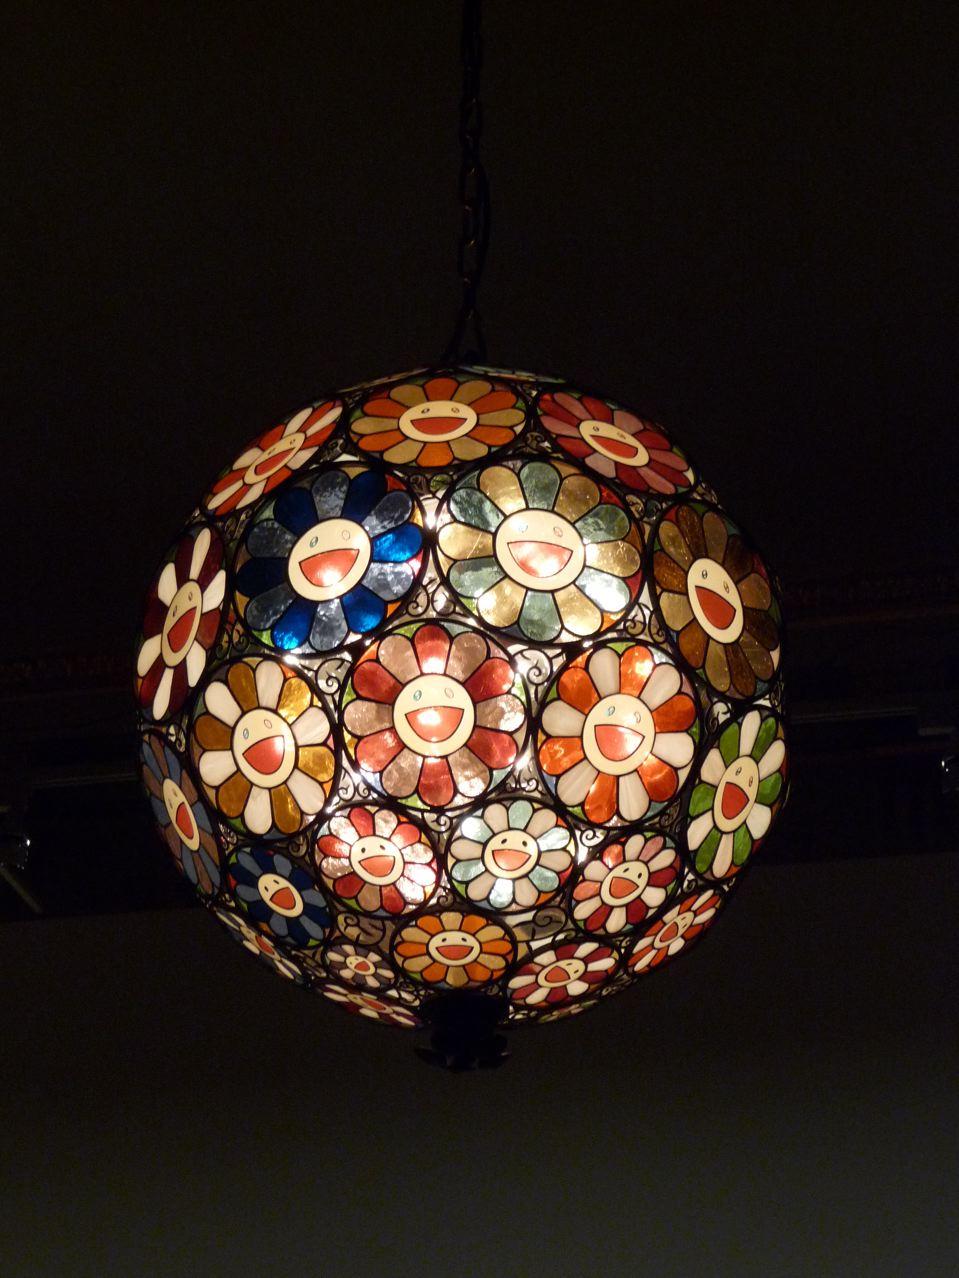 Exposition de Takashi Murakami au château de Versailles